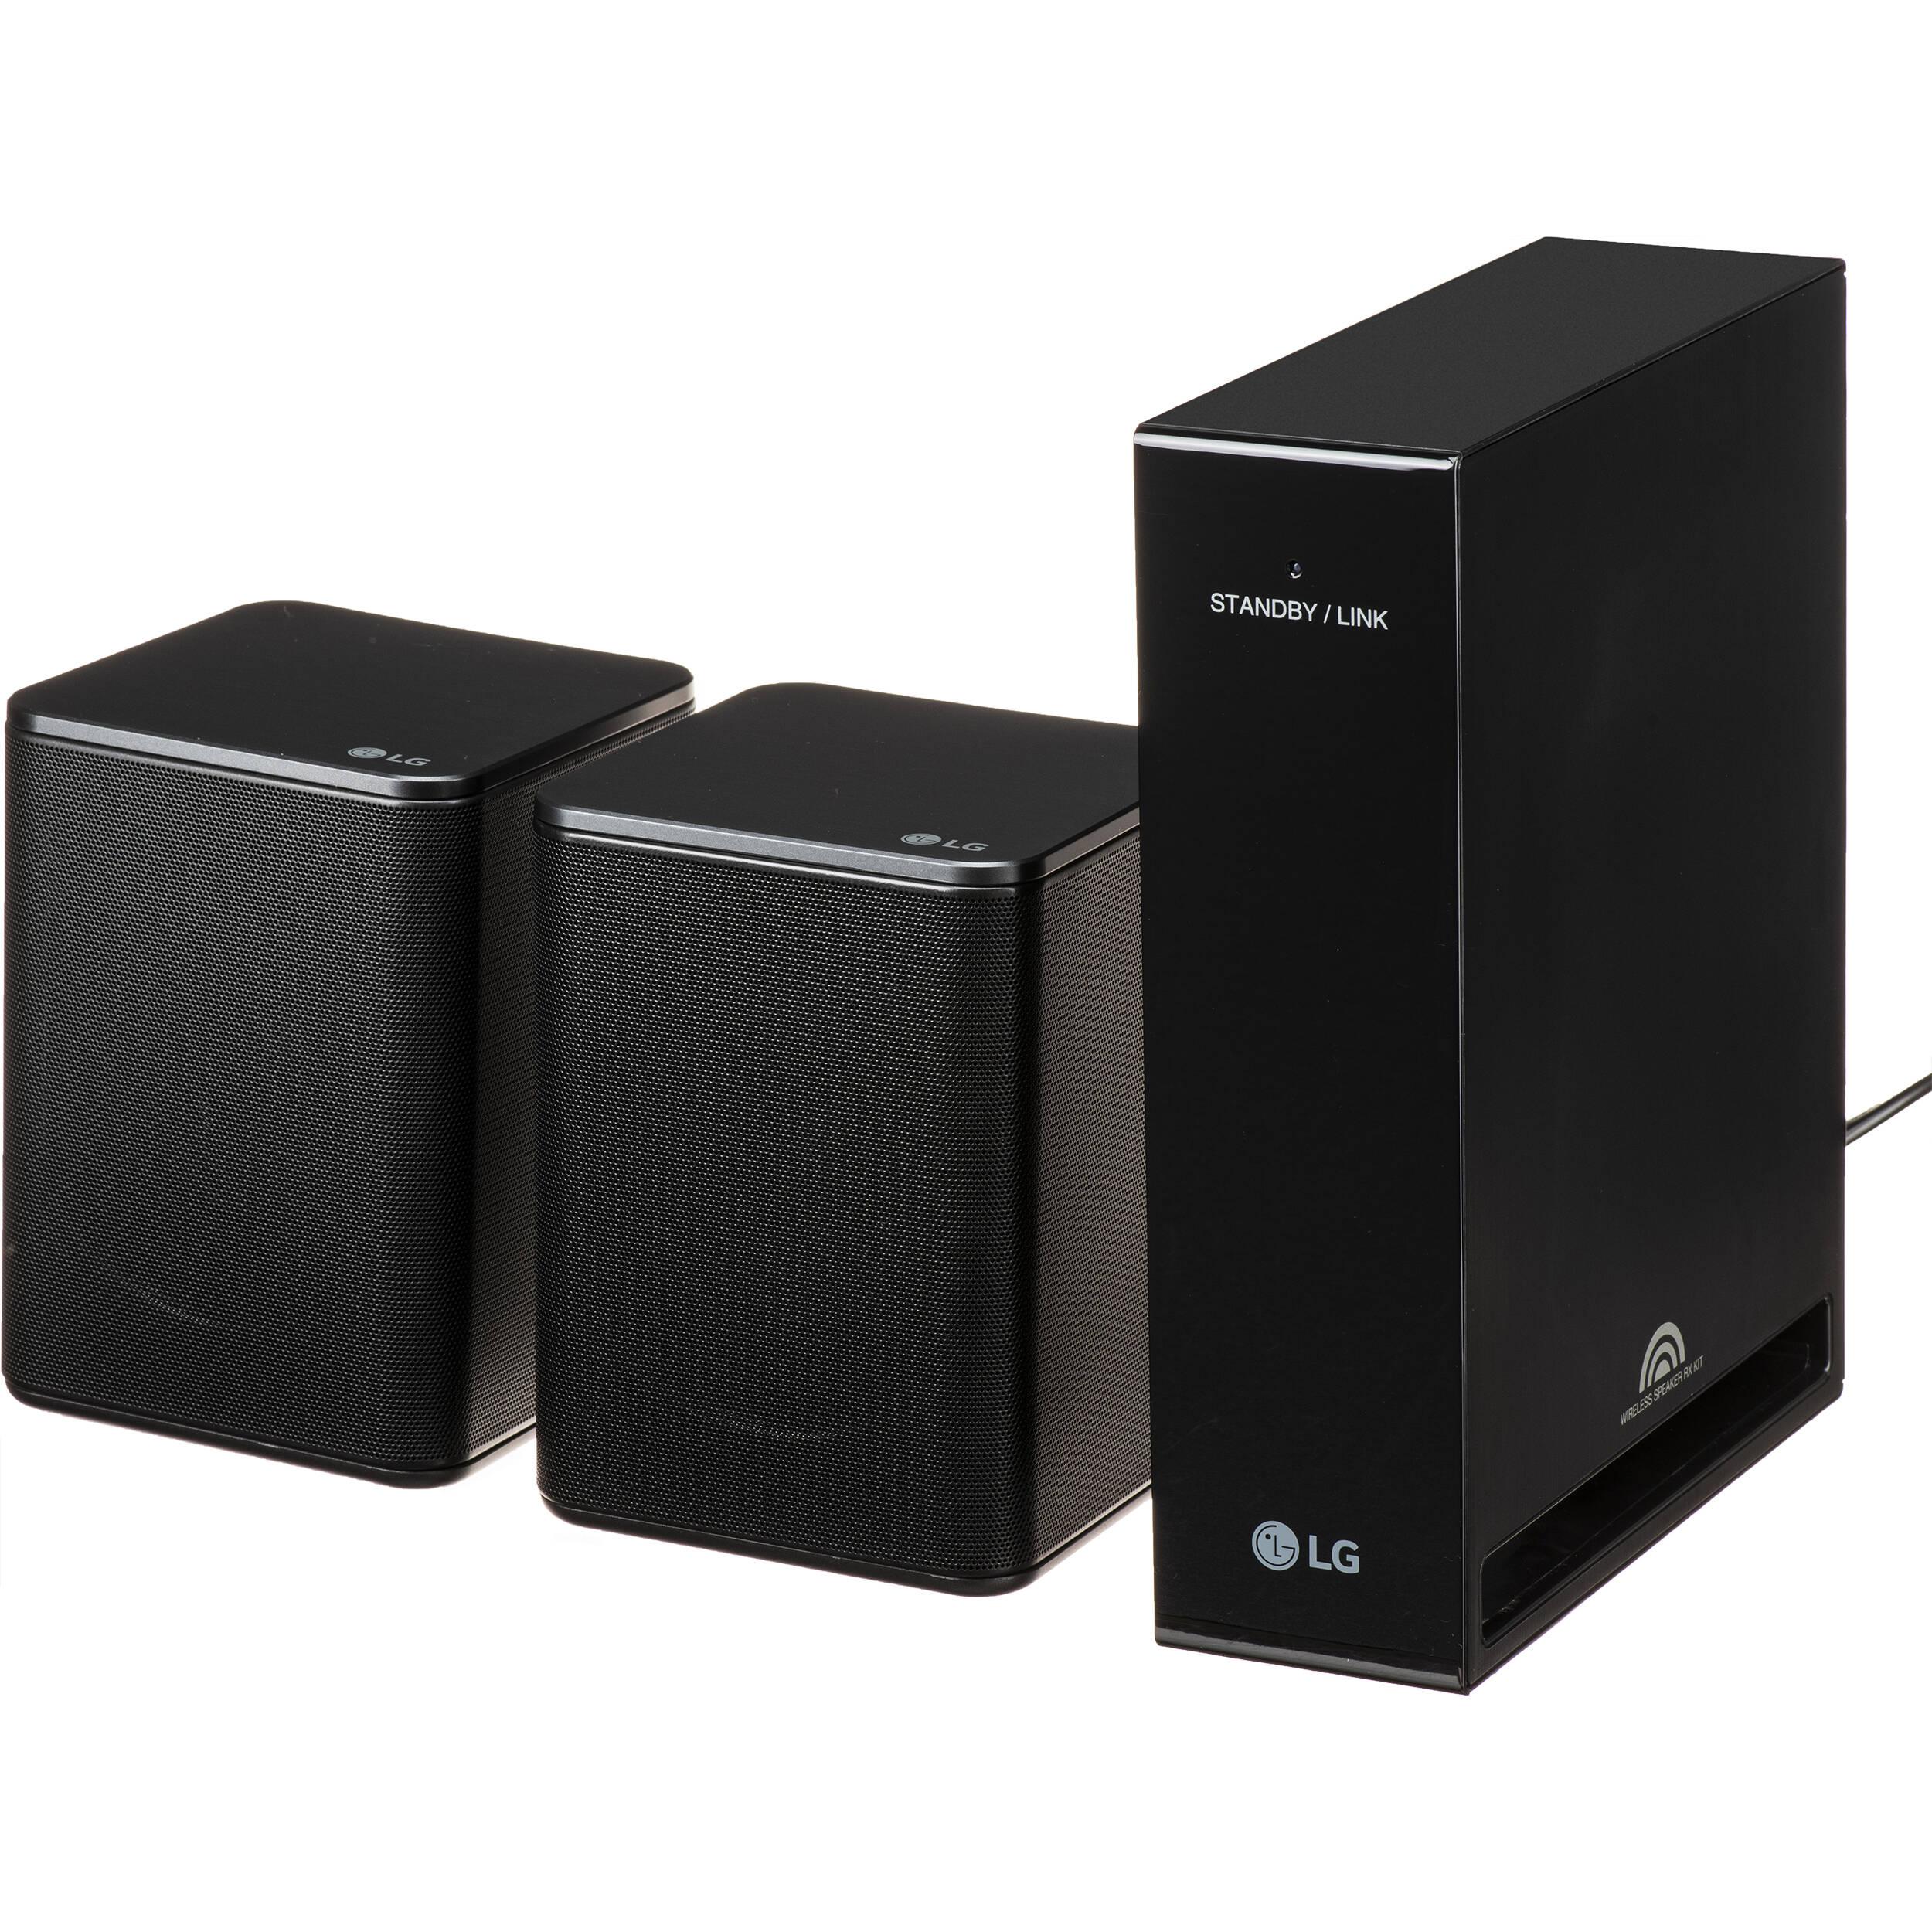 LG SPK9-S Wireless Rear Speaker Accessory Kit for Select Soundbars